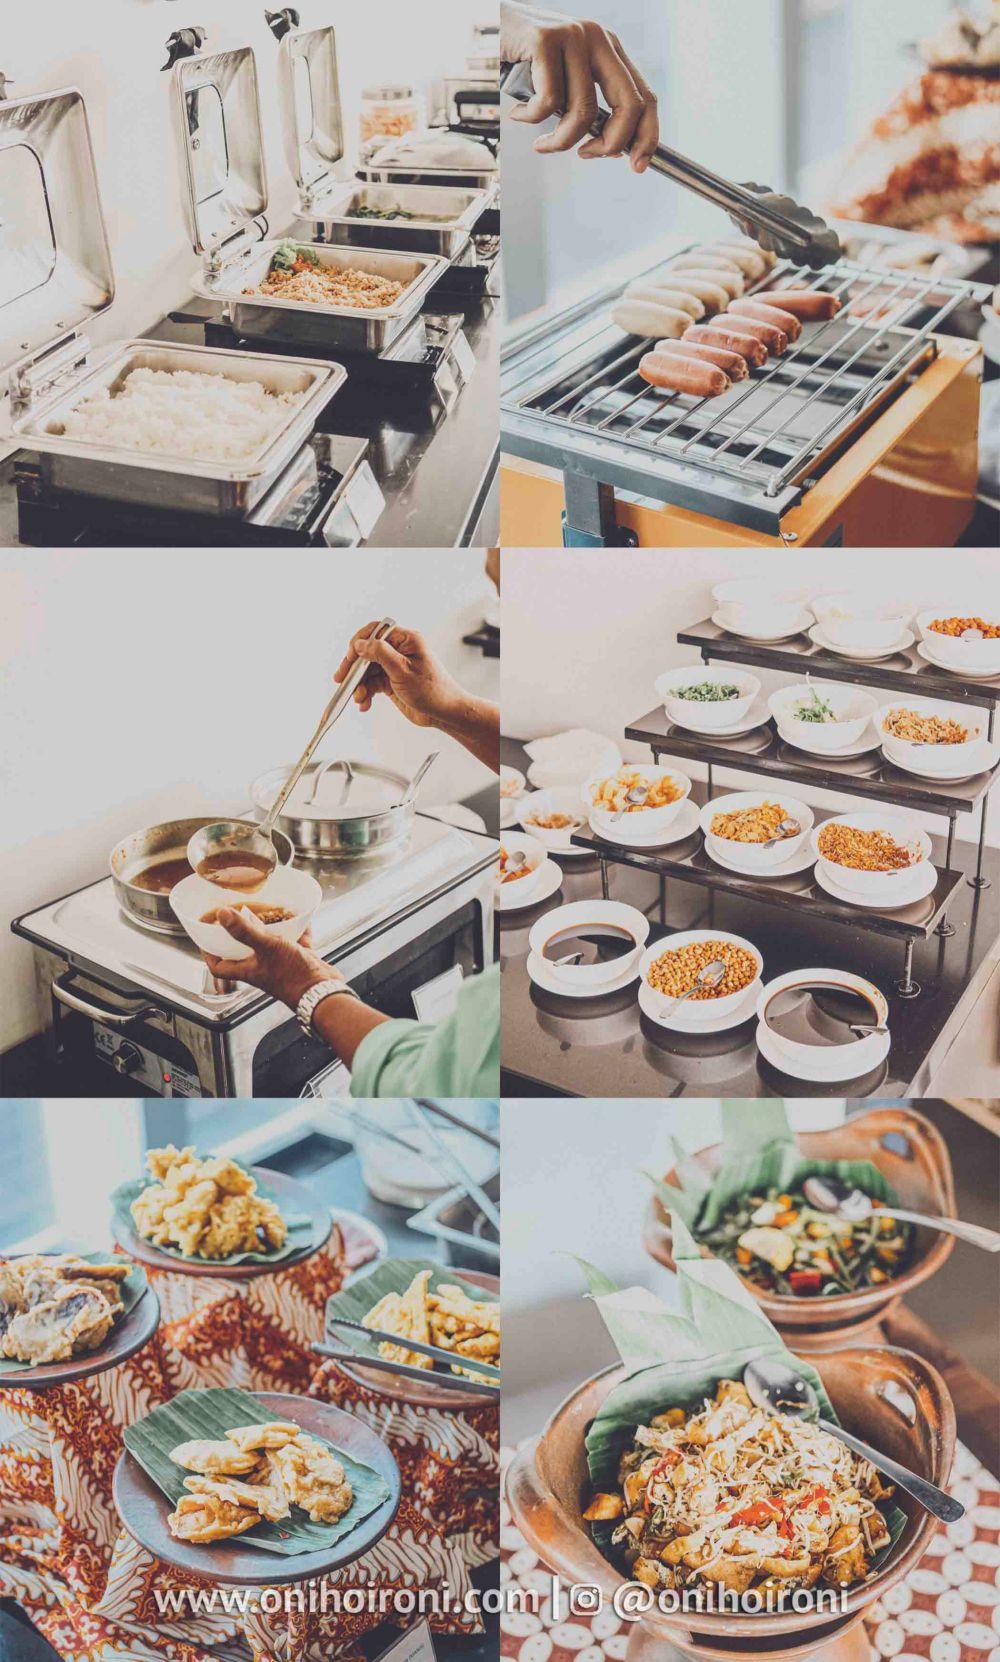 3 Sarapan pagi Restaurant whiz prime hotel maliboro review oni hoironi